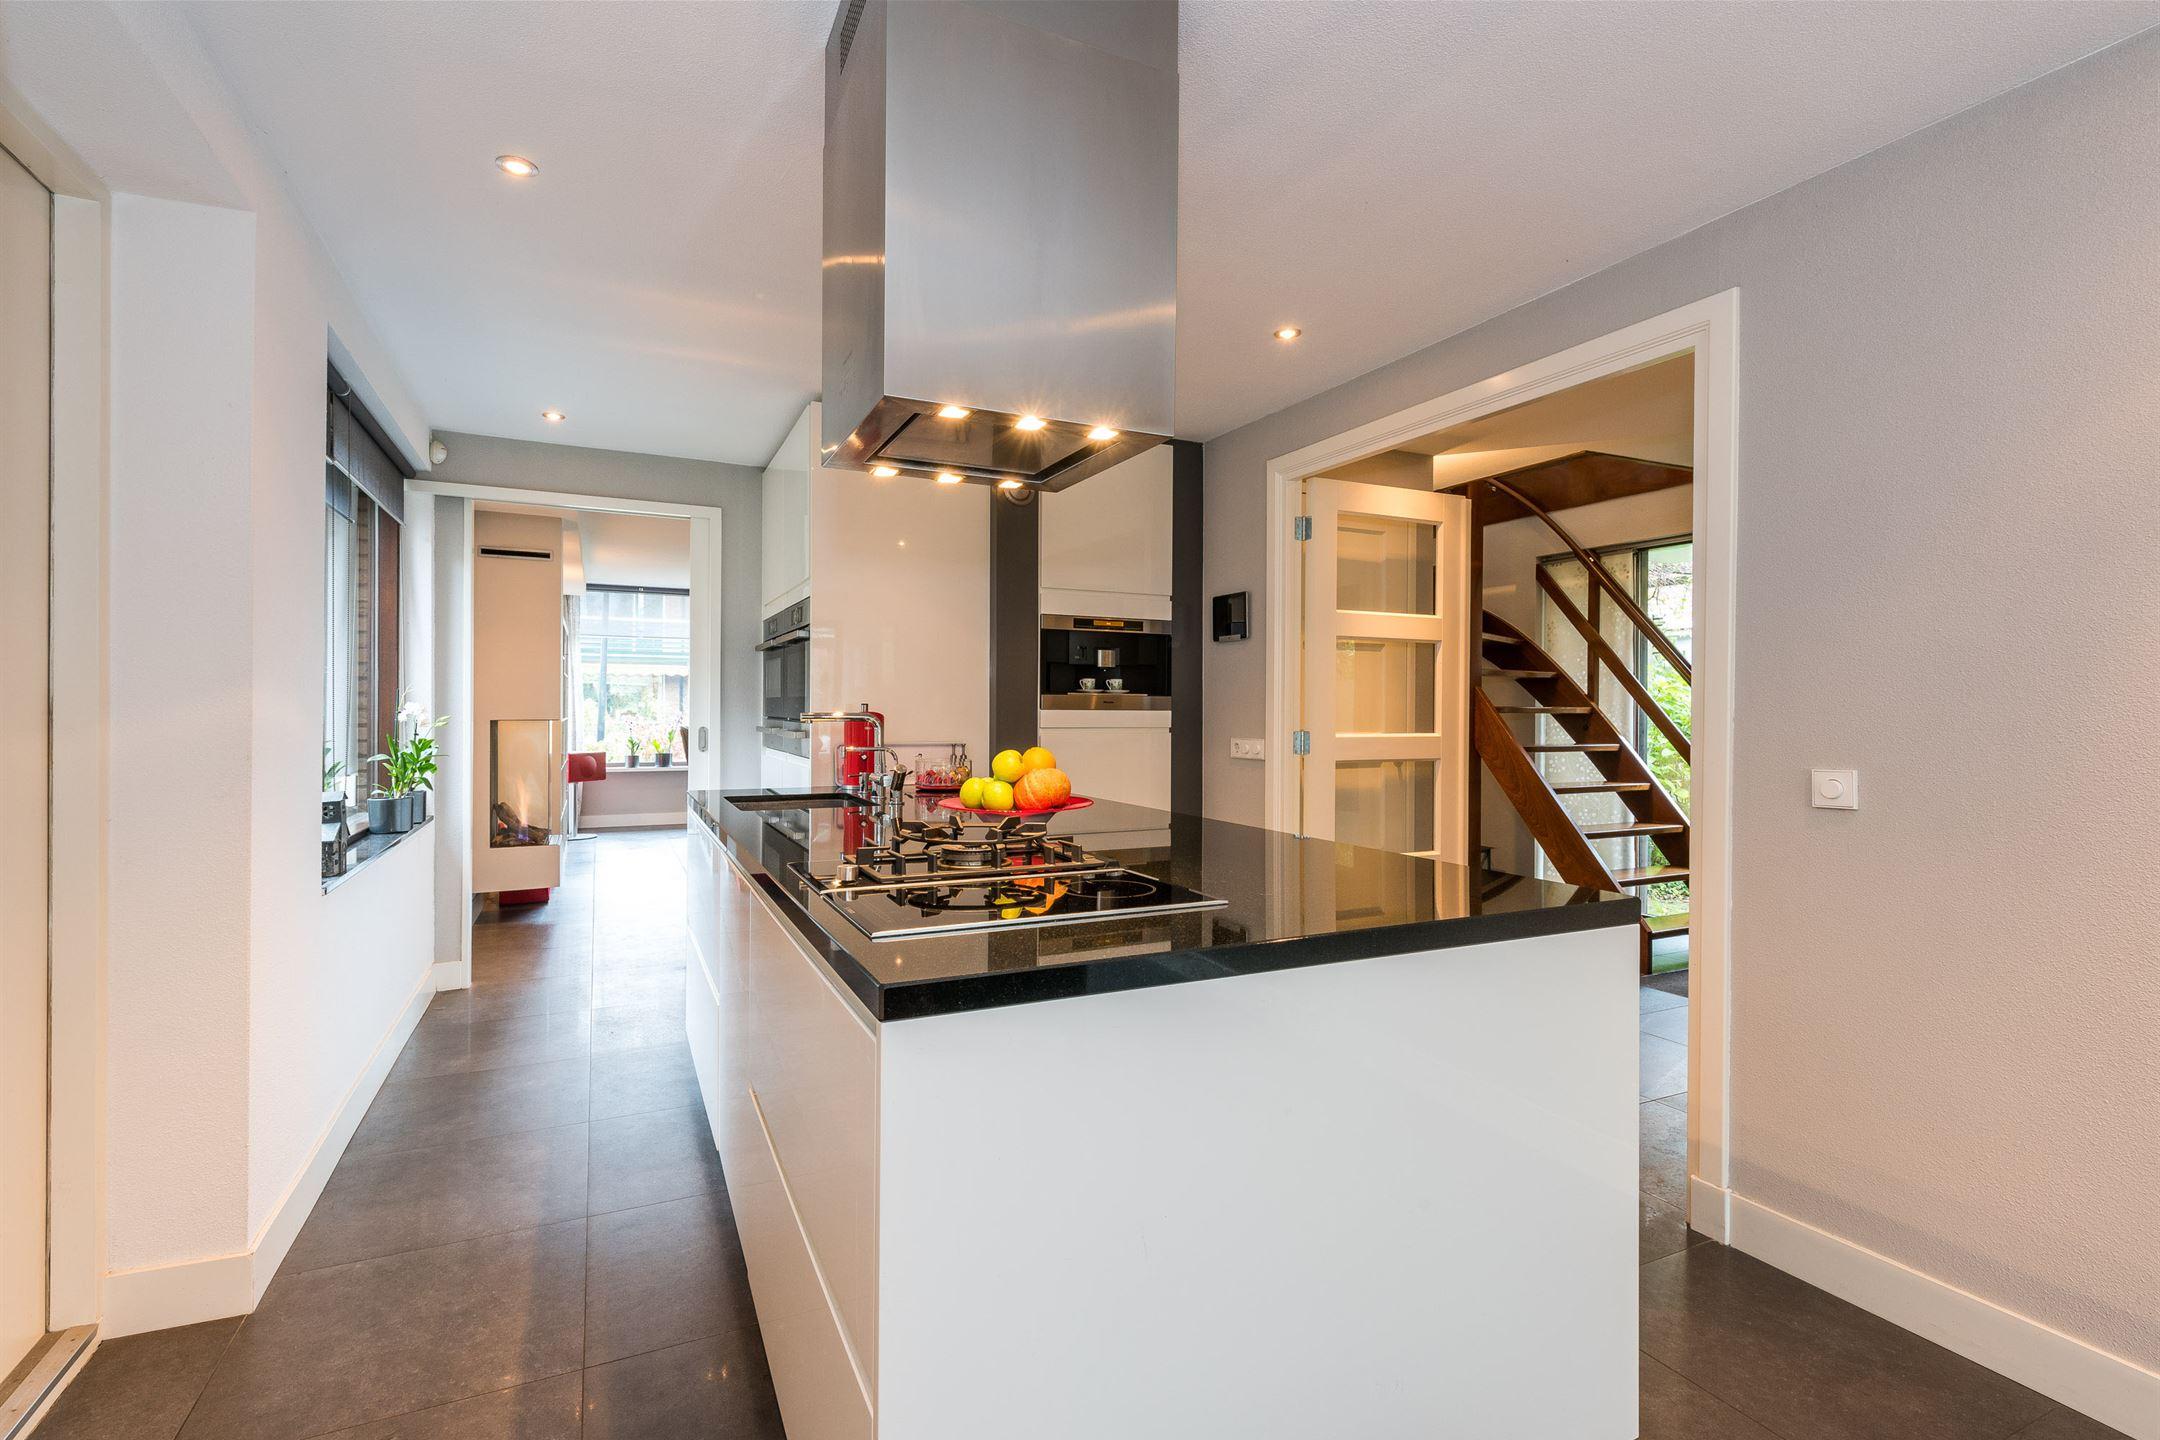 Huis te koop: abelendreef 7 3137 ca vlaardingen [funda]